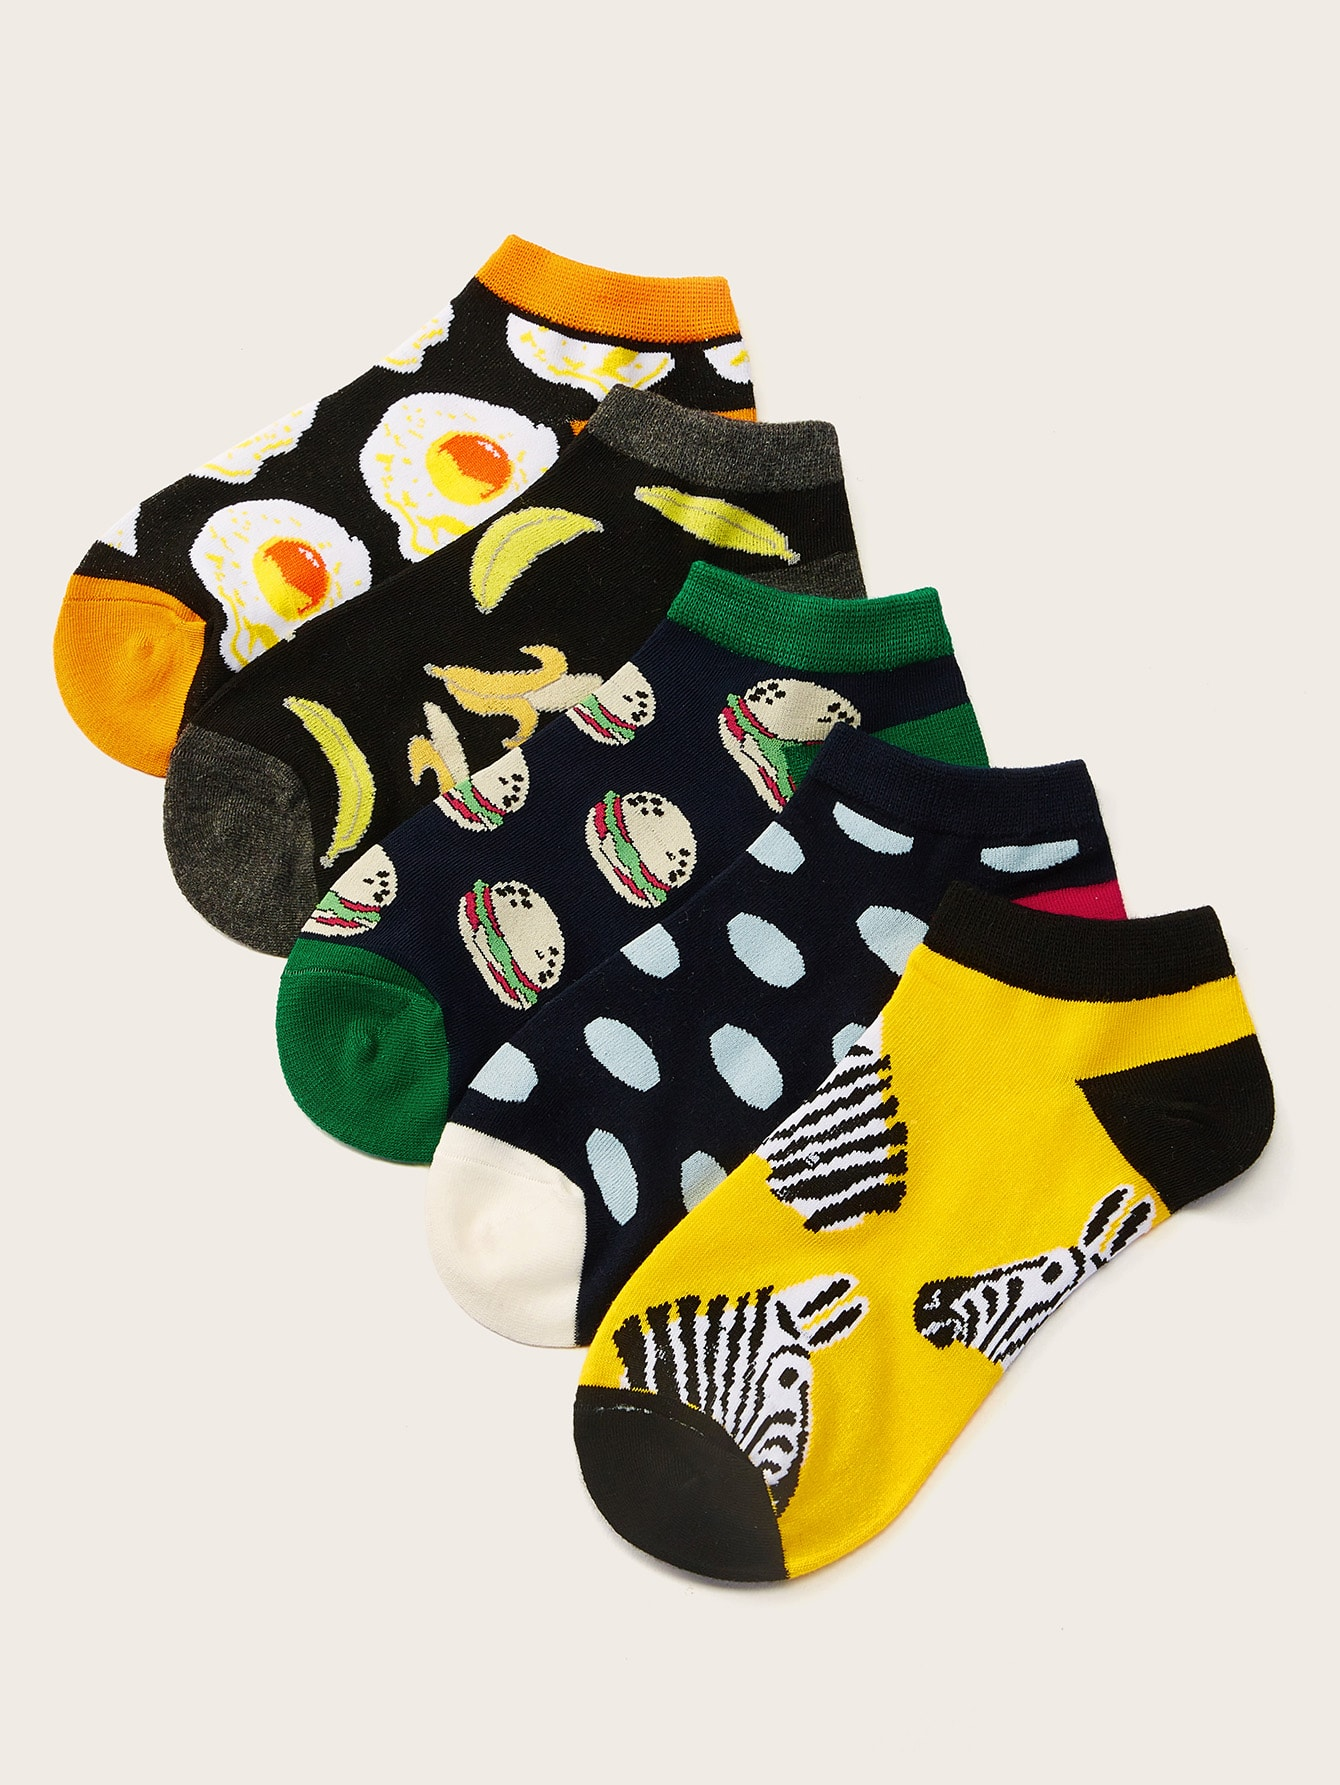 Hamburger & Banana Pattern Ankle Socks 5pairs null, ,